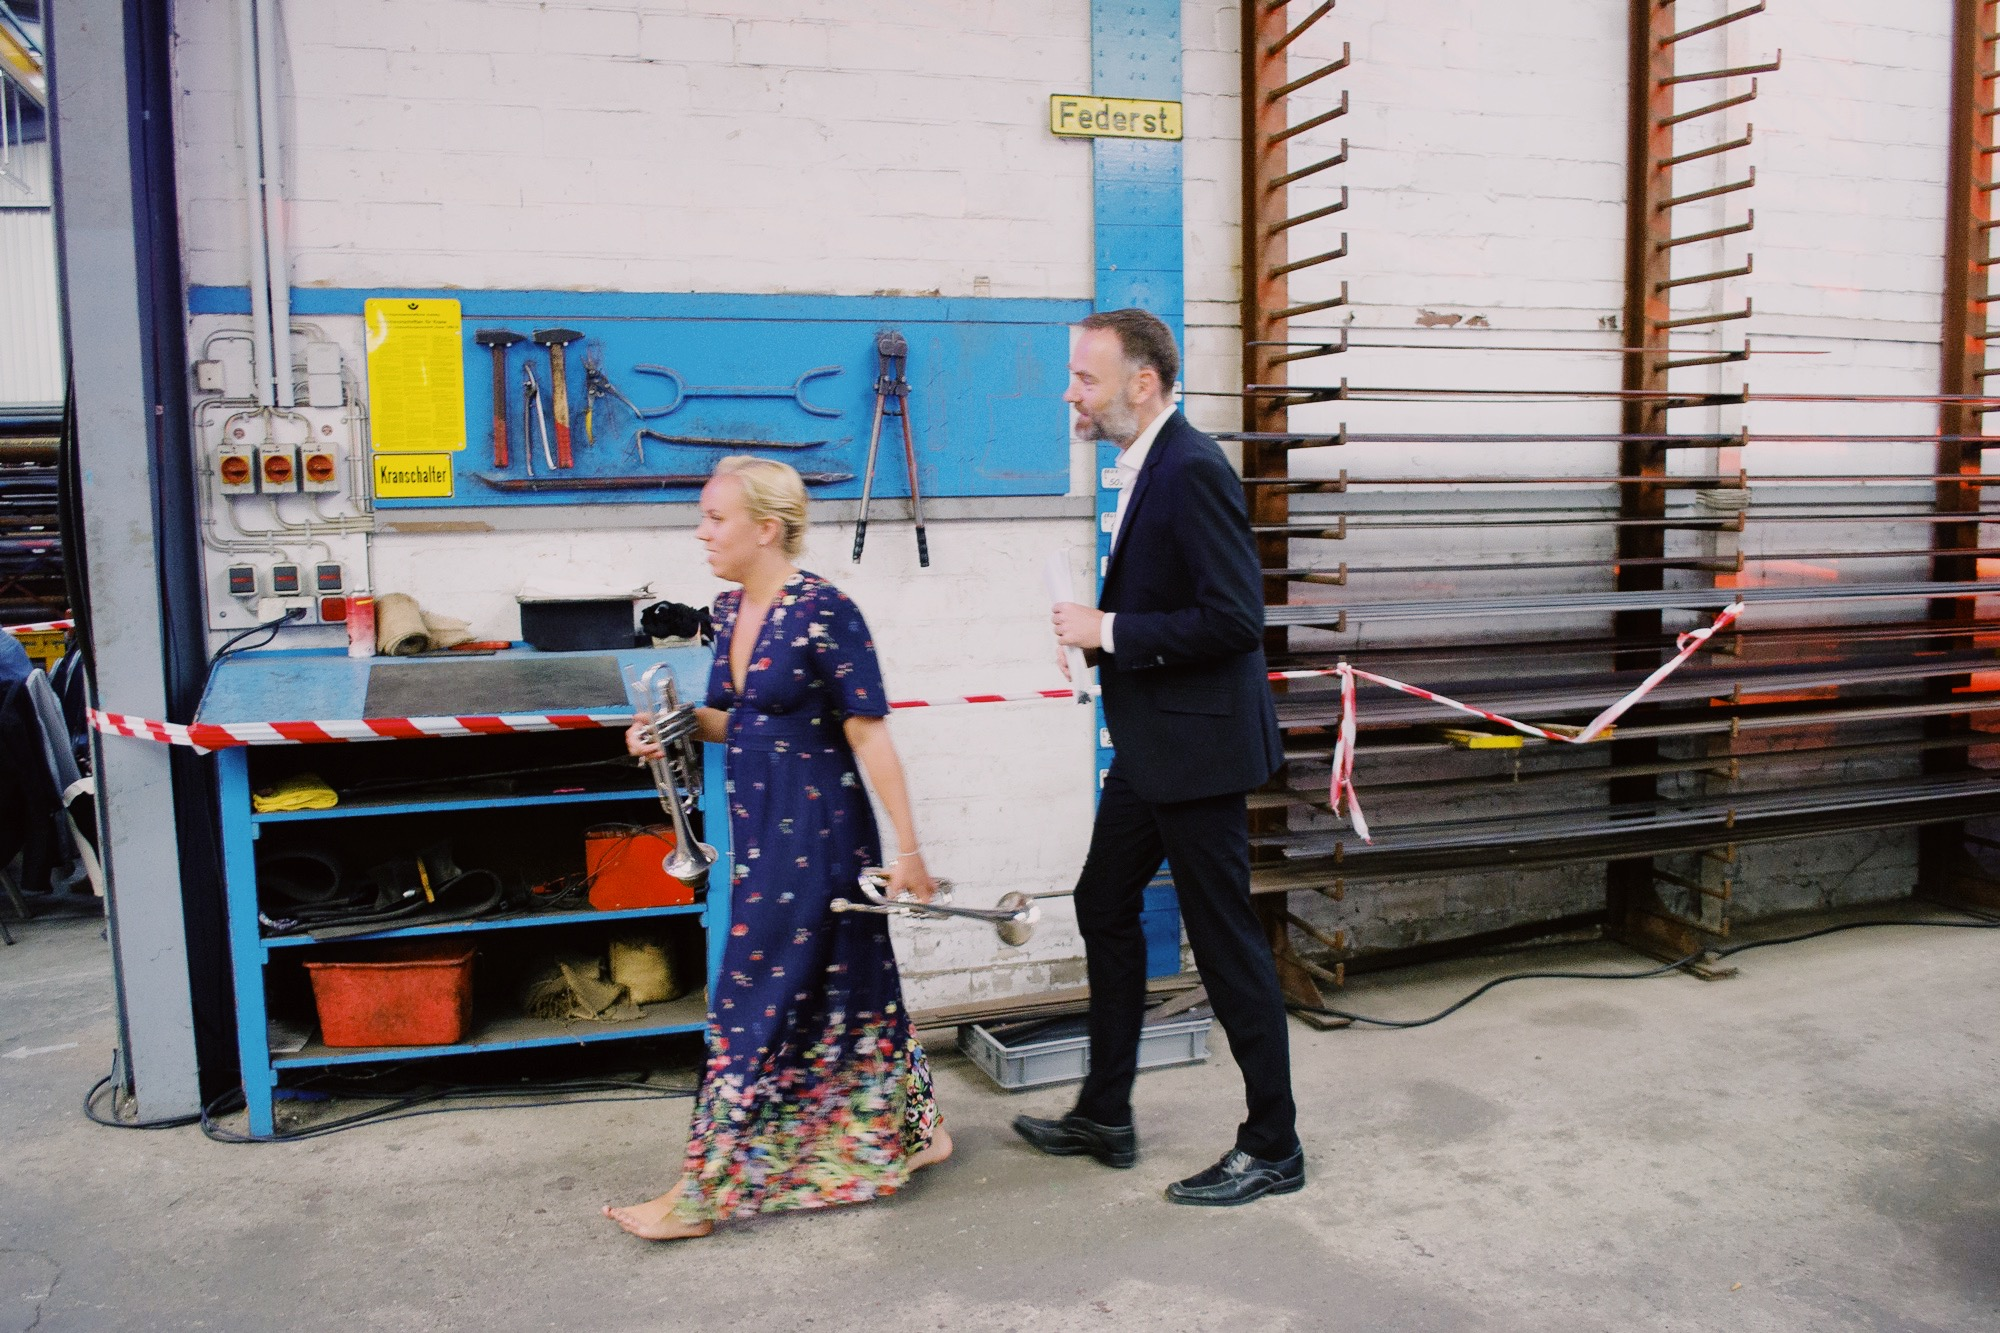 Tine Thing Helseth und Gunnar Flagstad